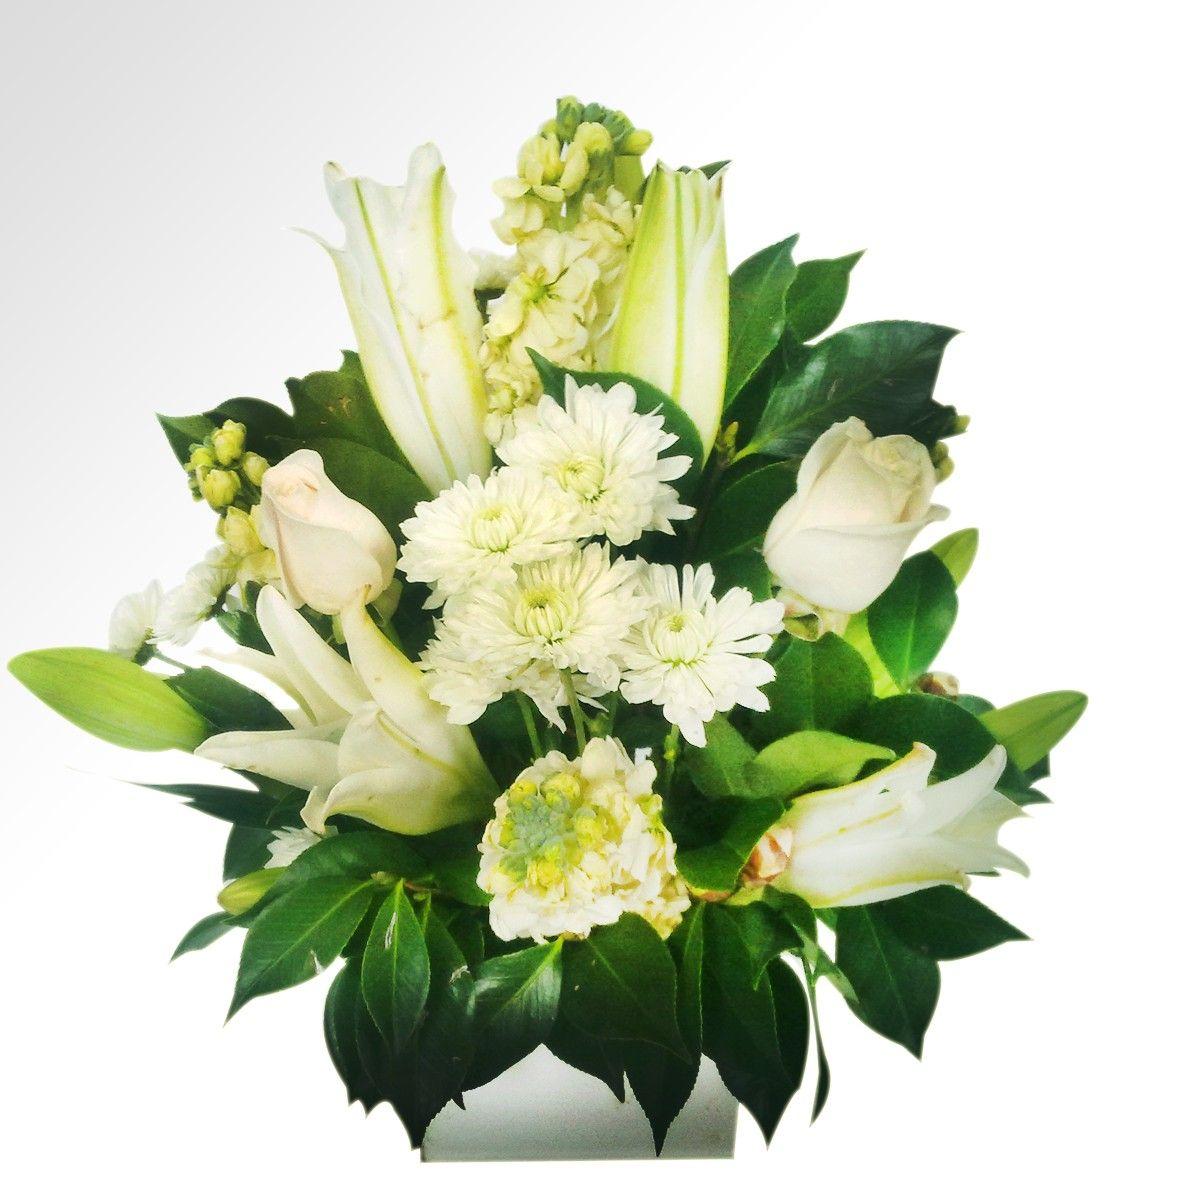 Funeral flower arrangements sympathy flowers melbourne funeral funeral flower arrangements sympathy flowers melbourne funeral flower arrangement delivery izmirmasajfo